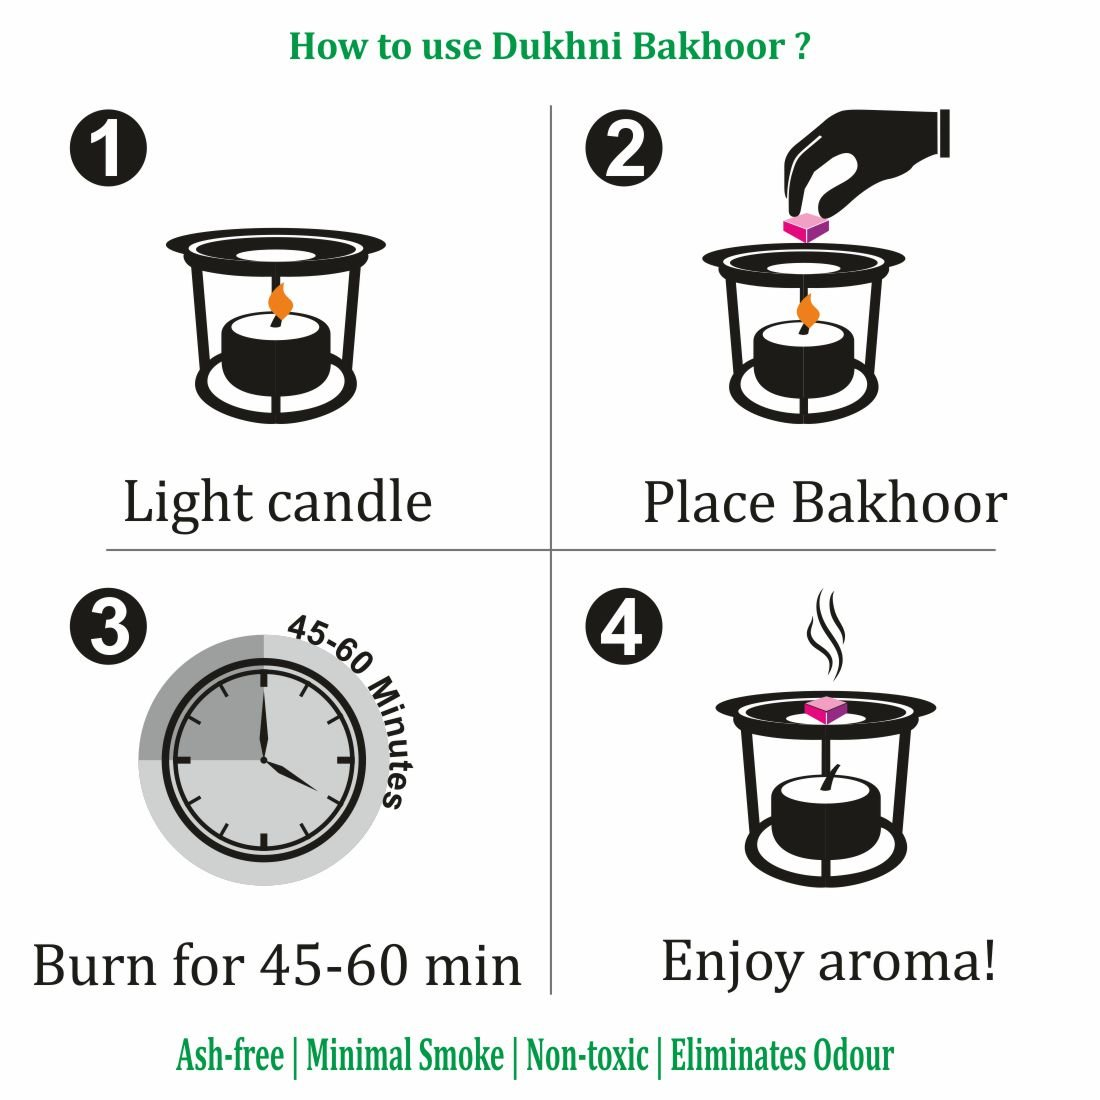 Dukhni Oud Bakhoor Incense Variety Box & Rainbow Bakhoor Burner - Gift Set & Starter Kit by Dukhni (Image #3)